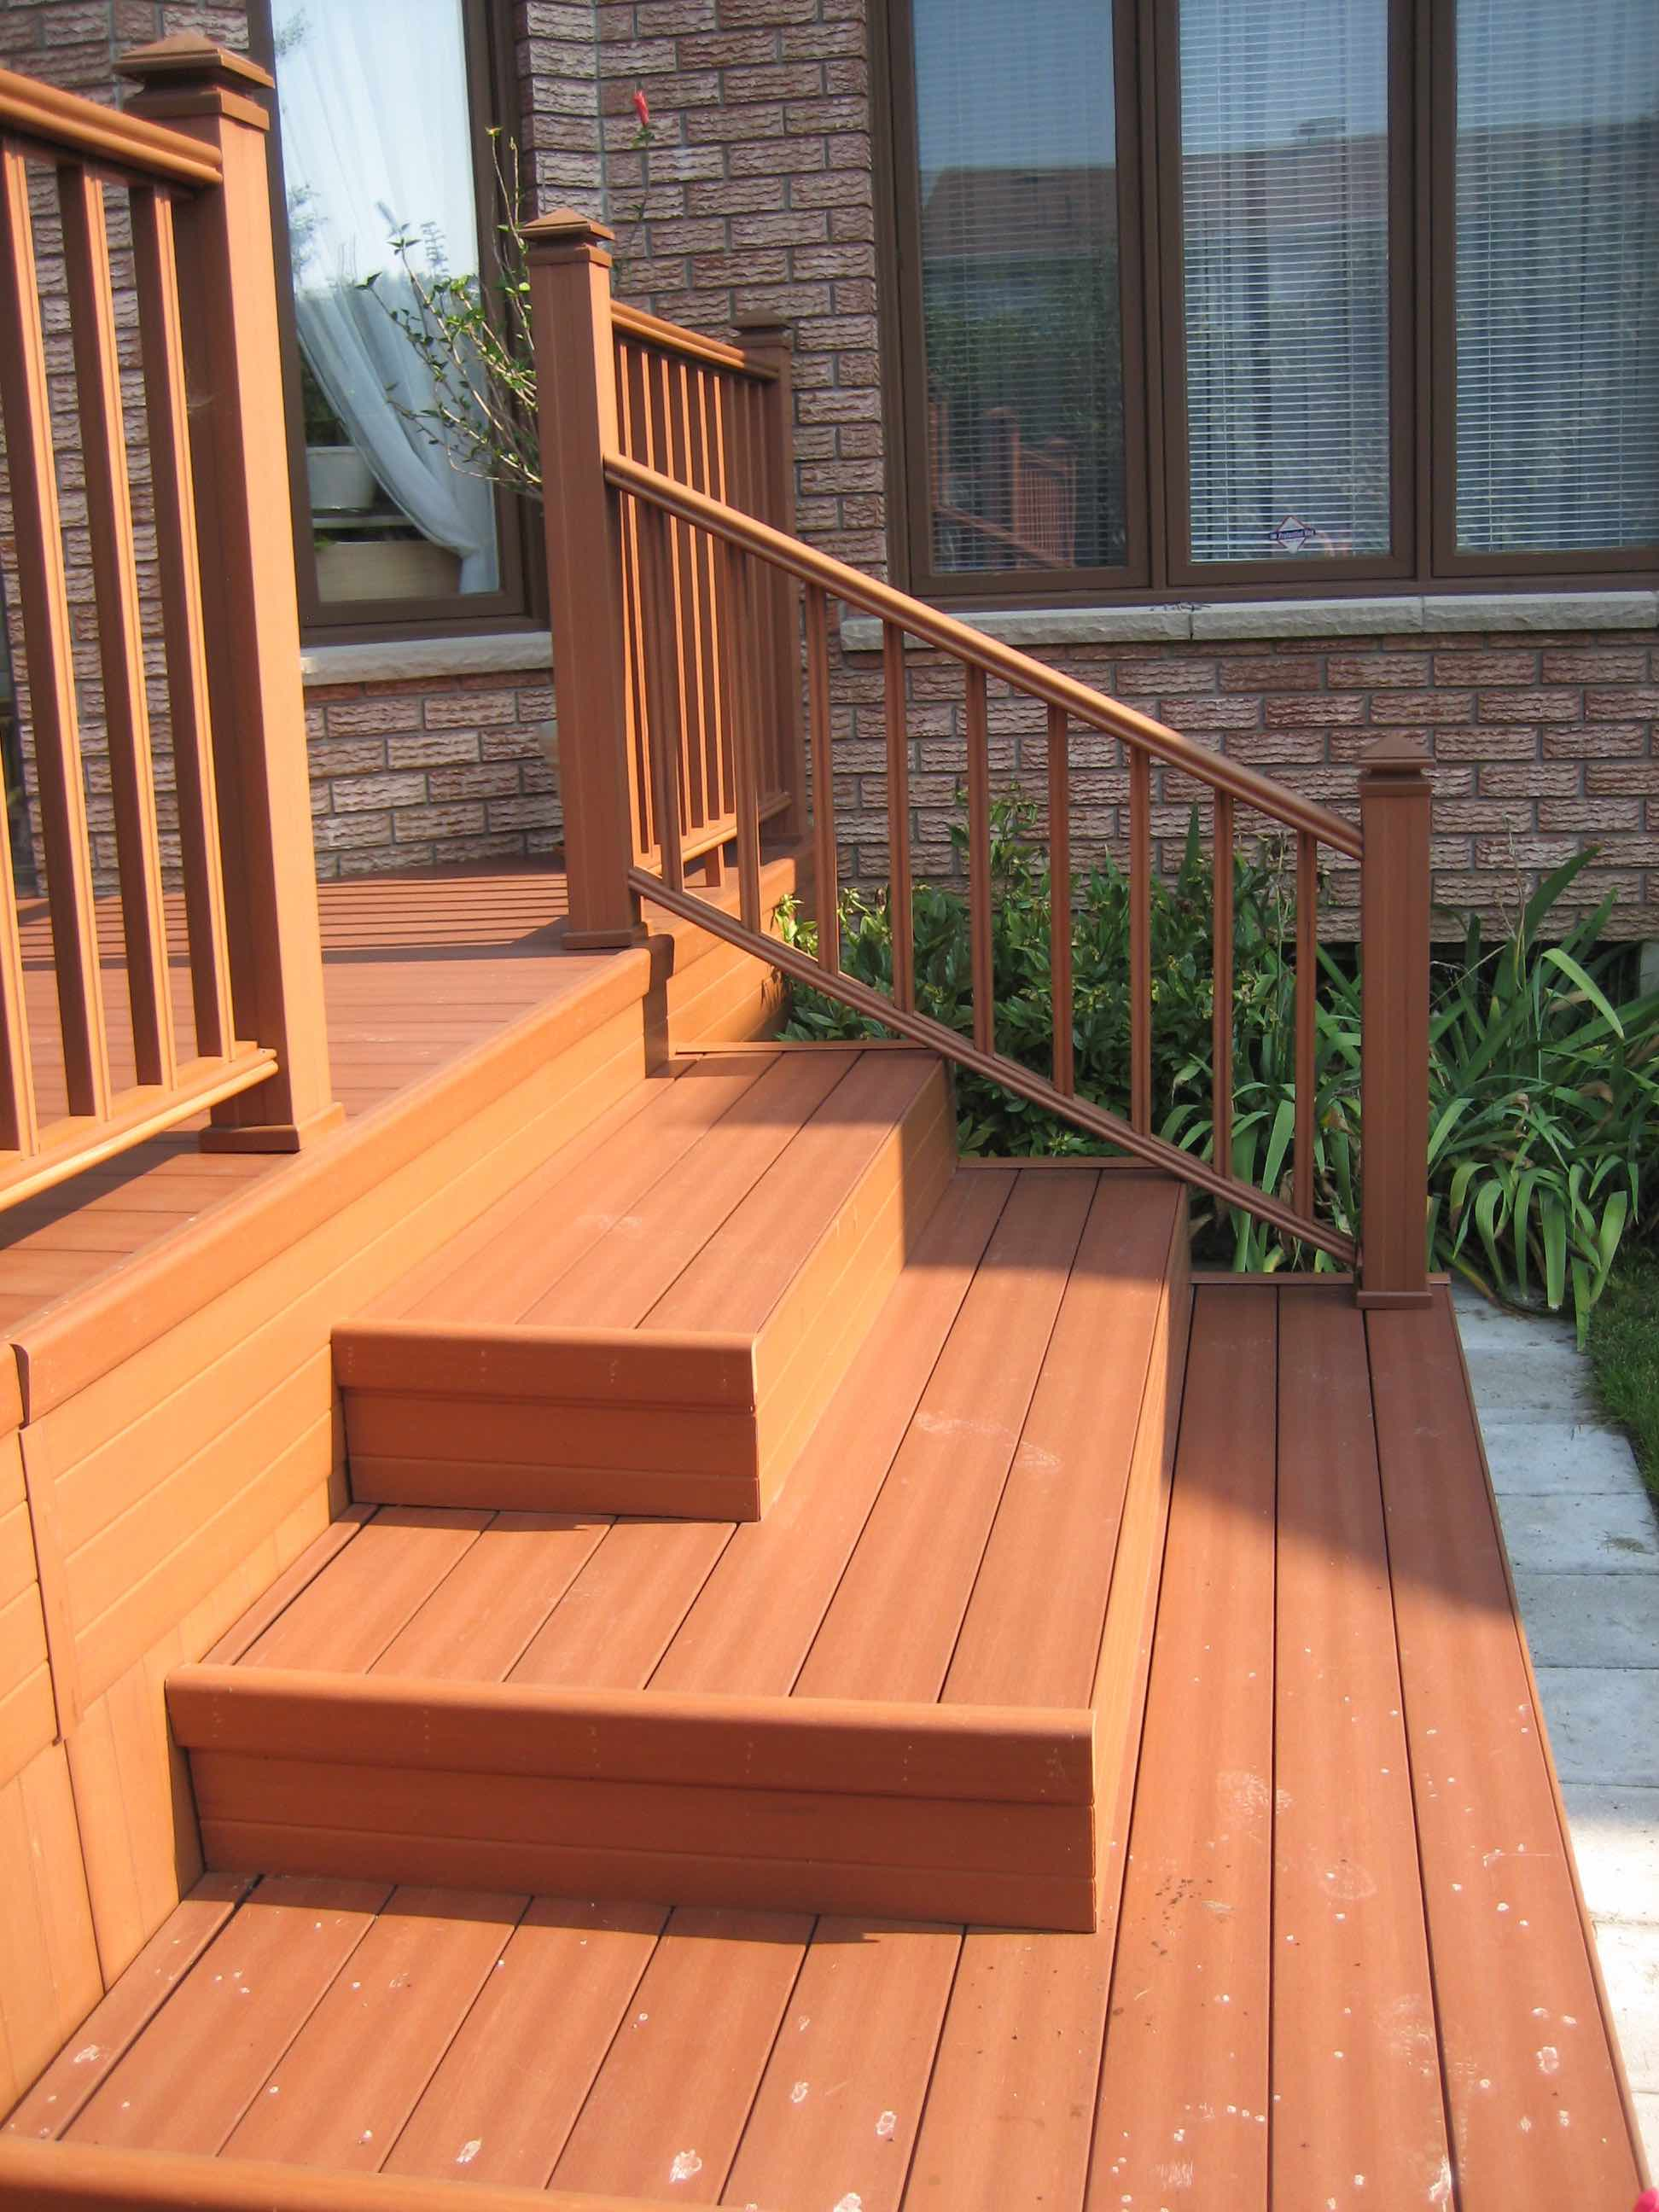 cedar deck, stairs and railing